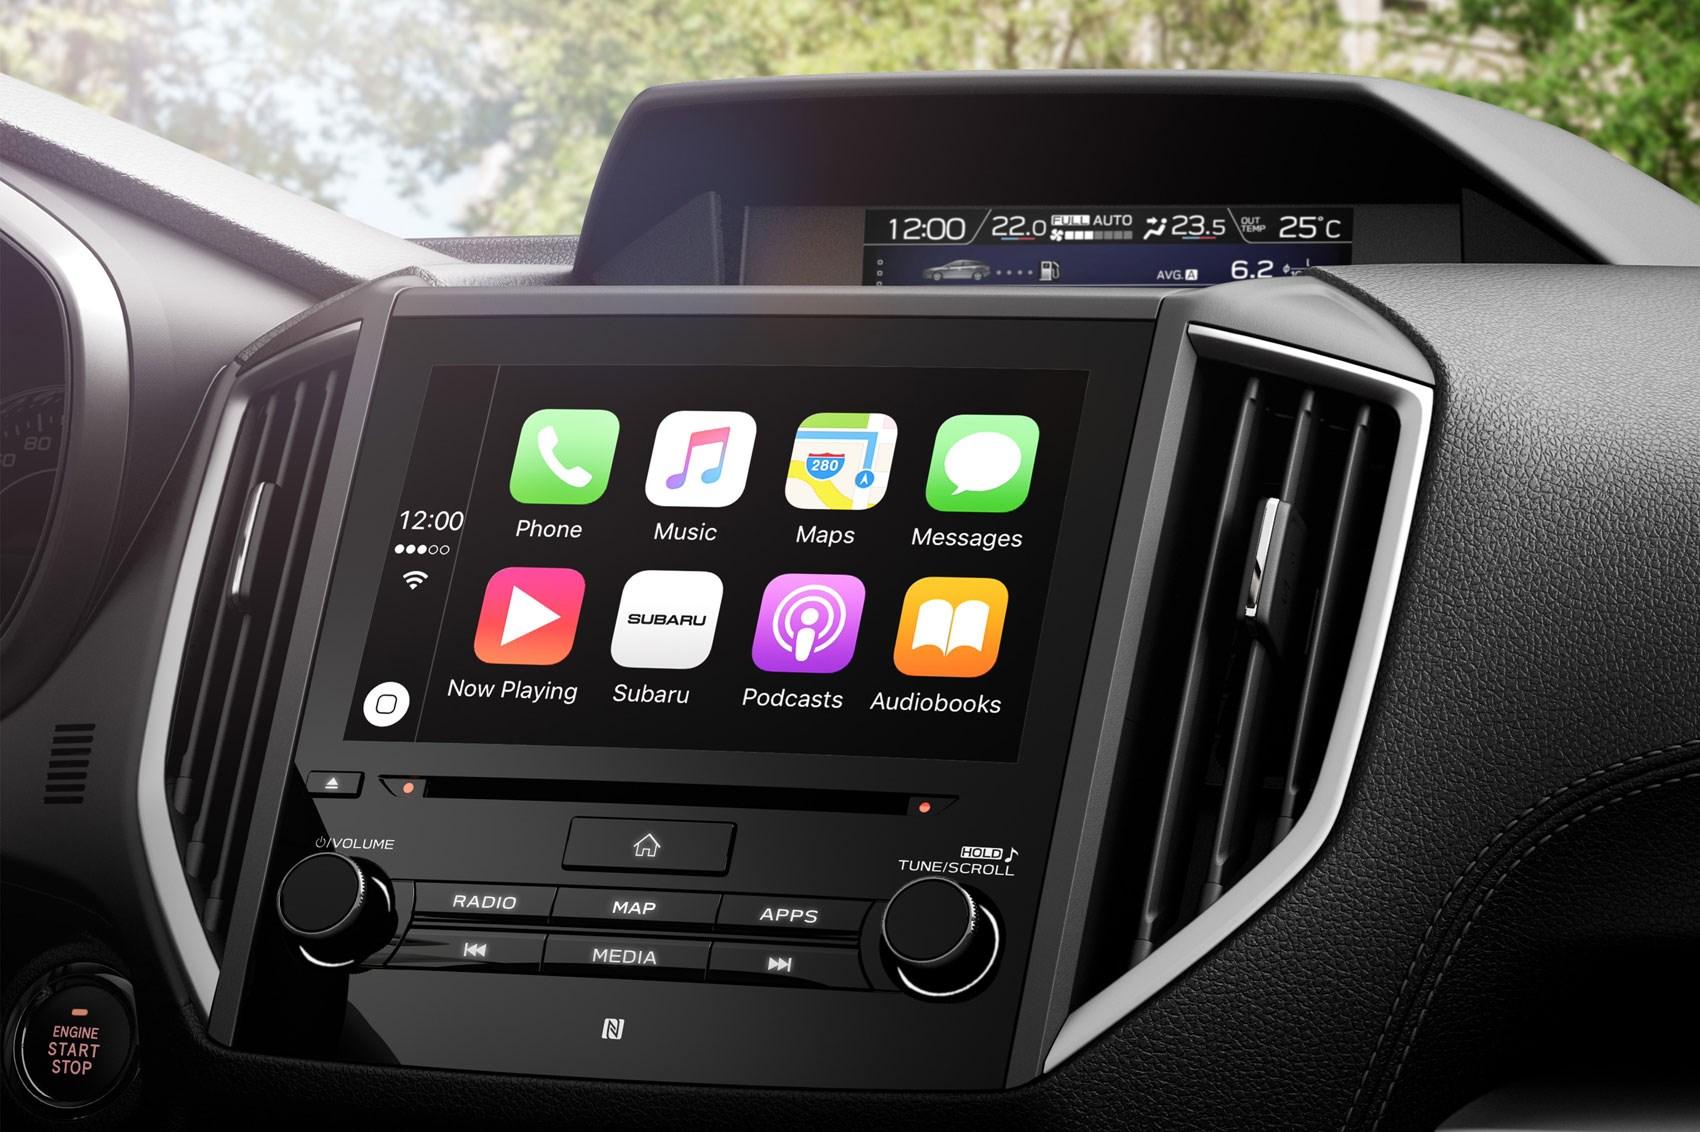 Le Carplay In The New Subaru Impreza